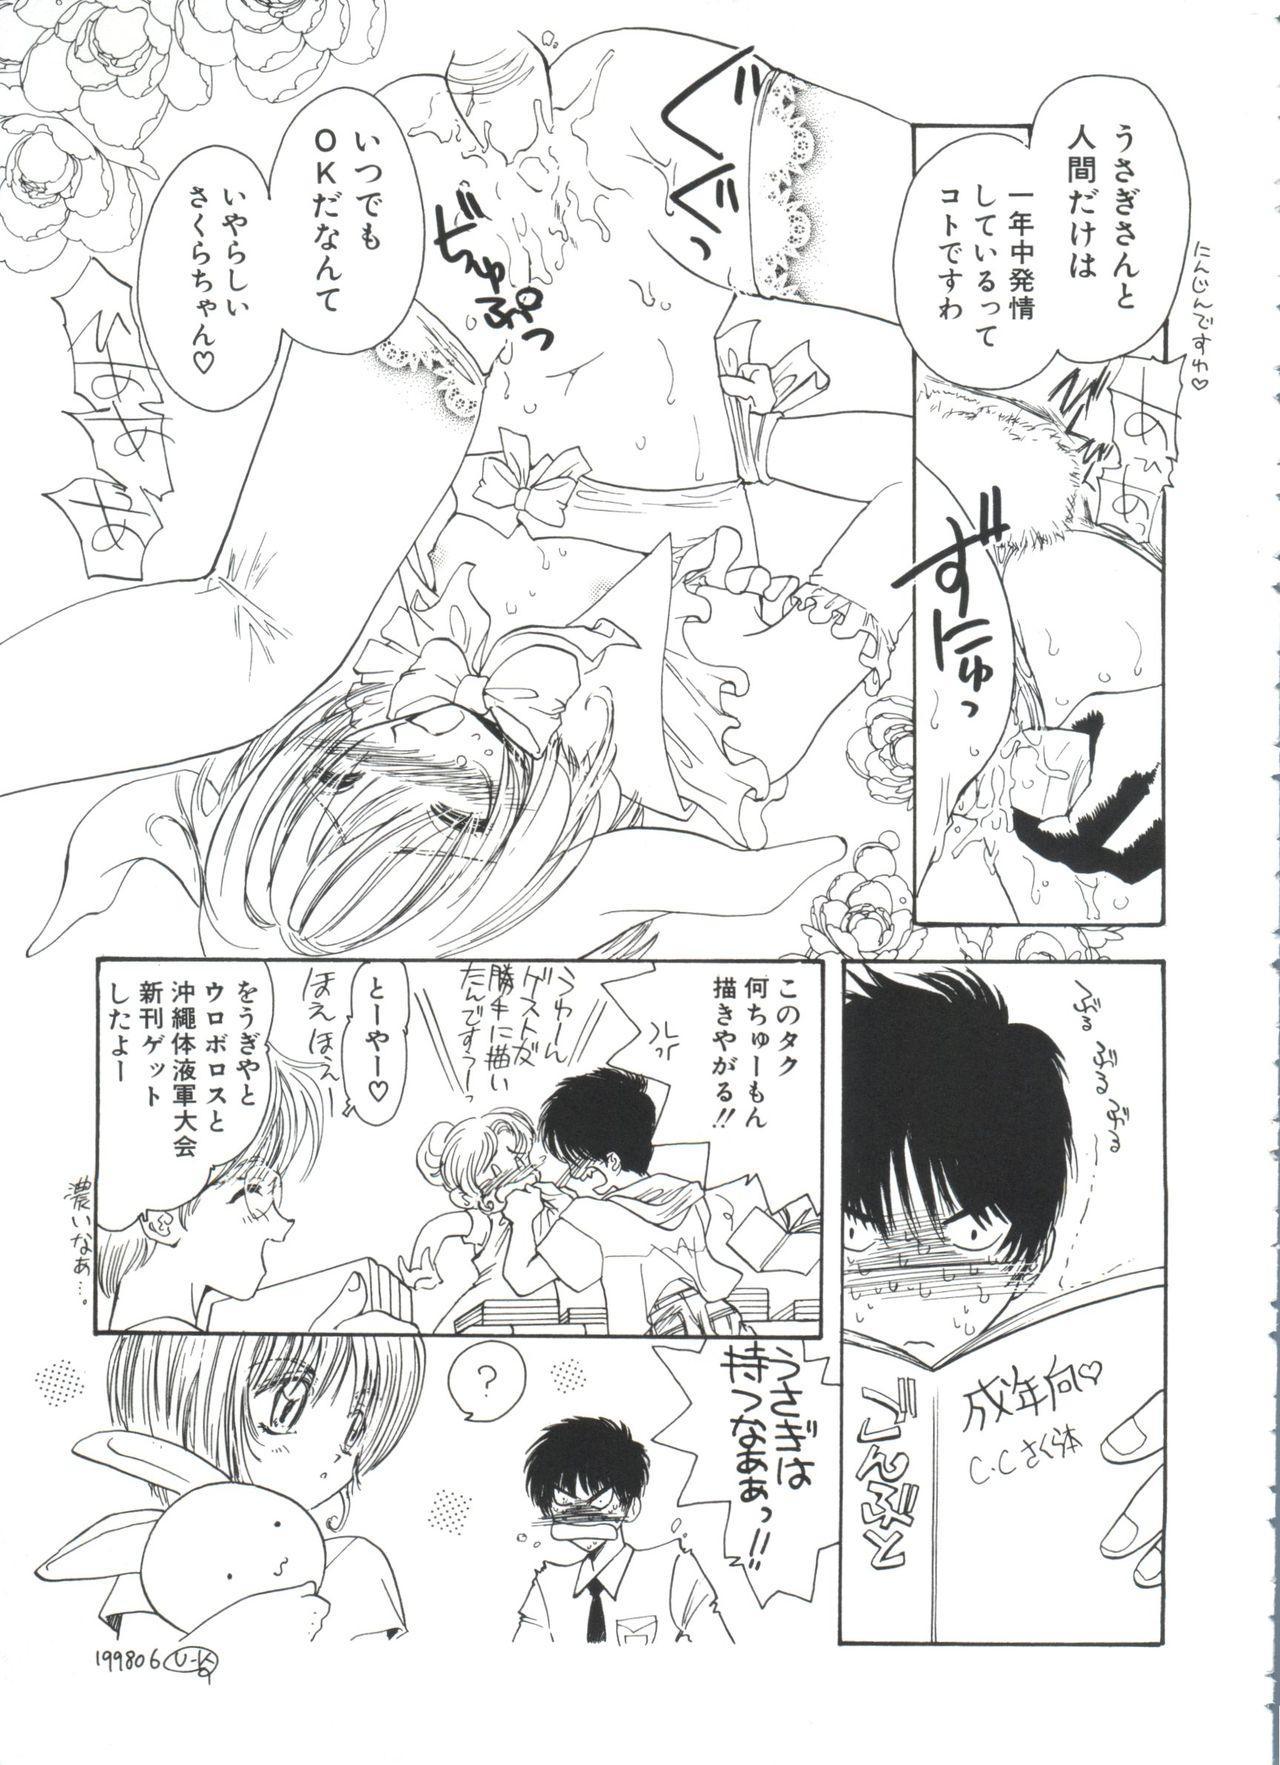 Ero-chan to Issho 2 38